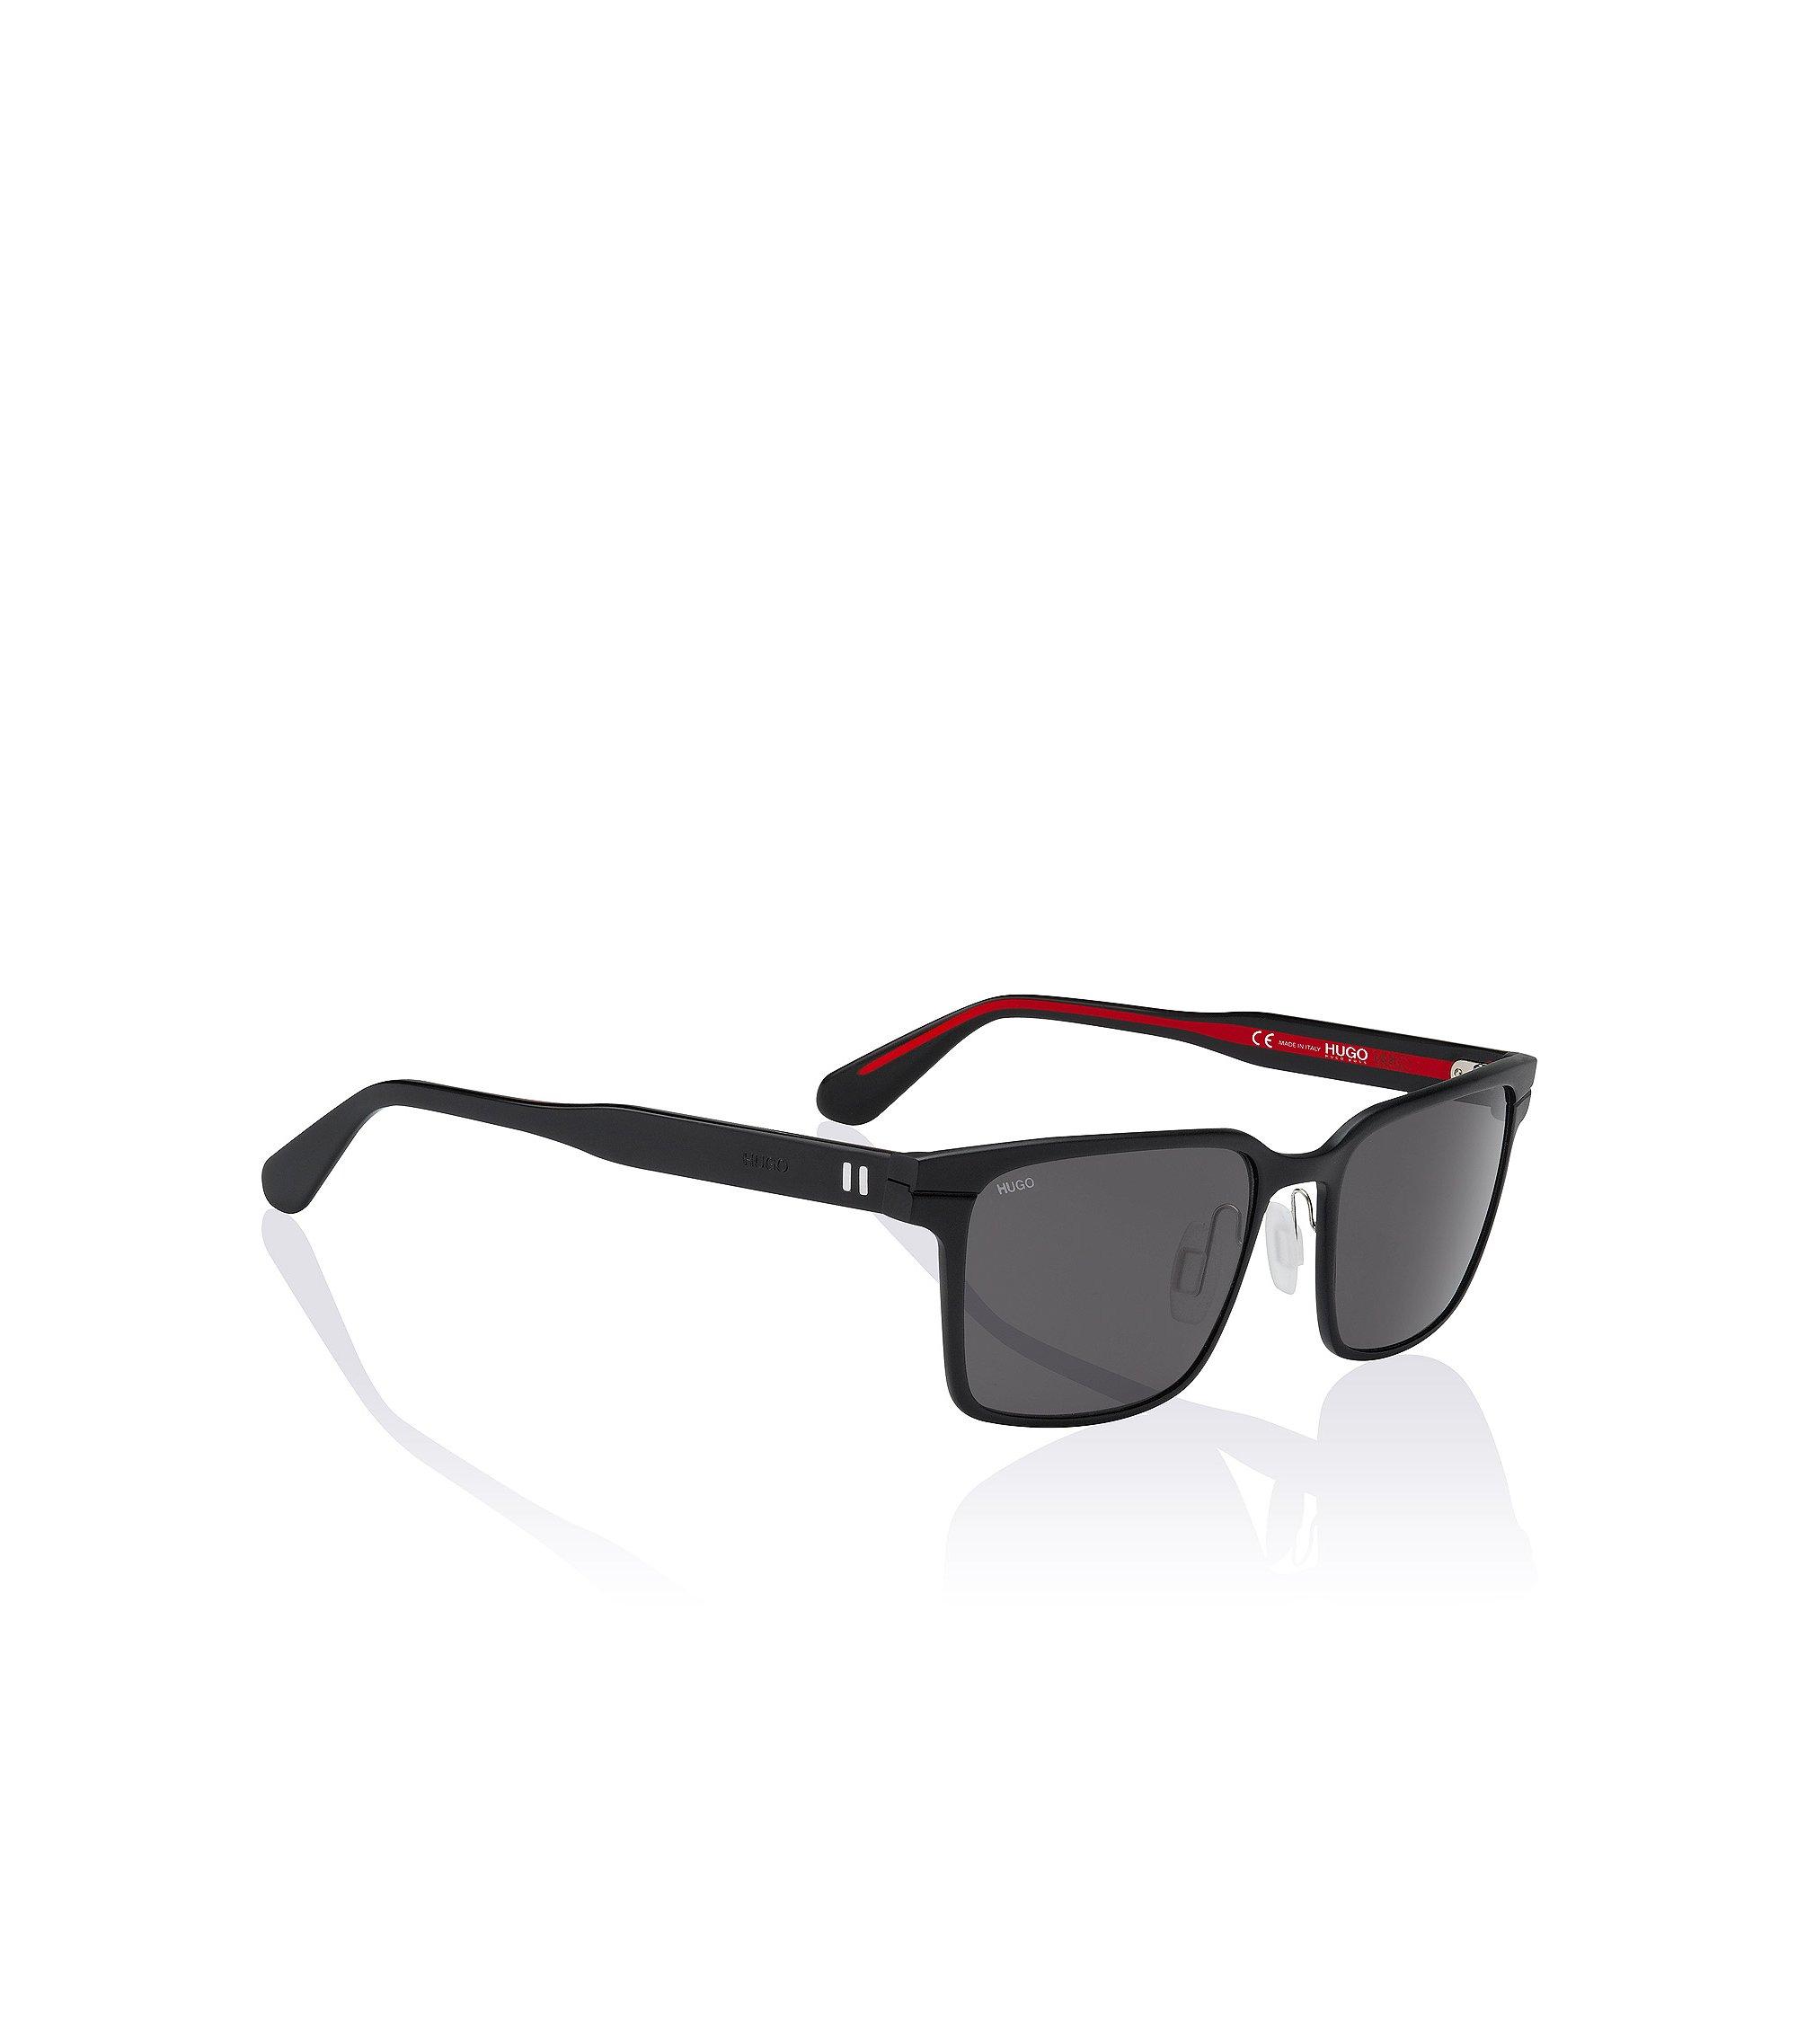 Sonnenbrille ´HUGO 0108/S`, Assorted-Pre-Pack